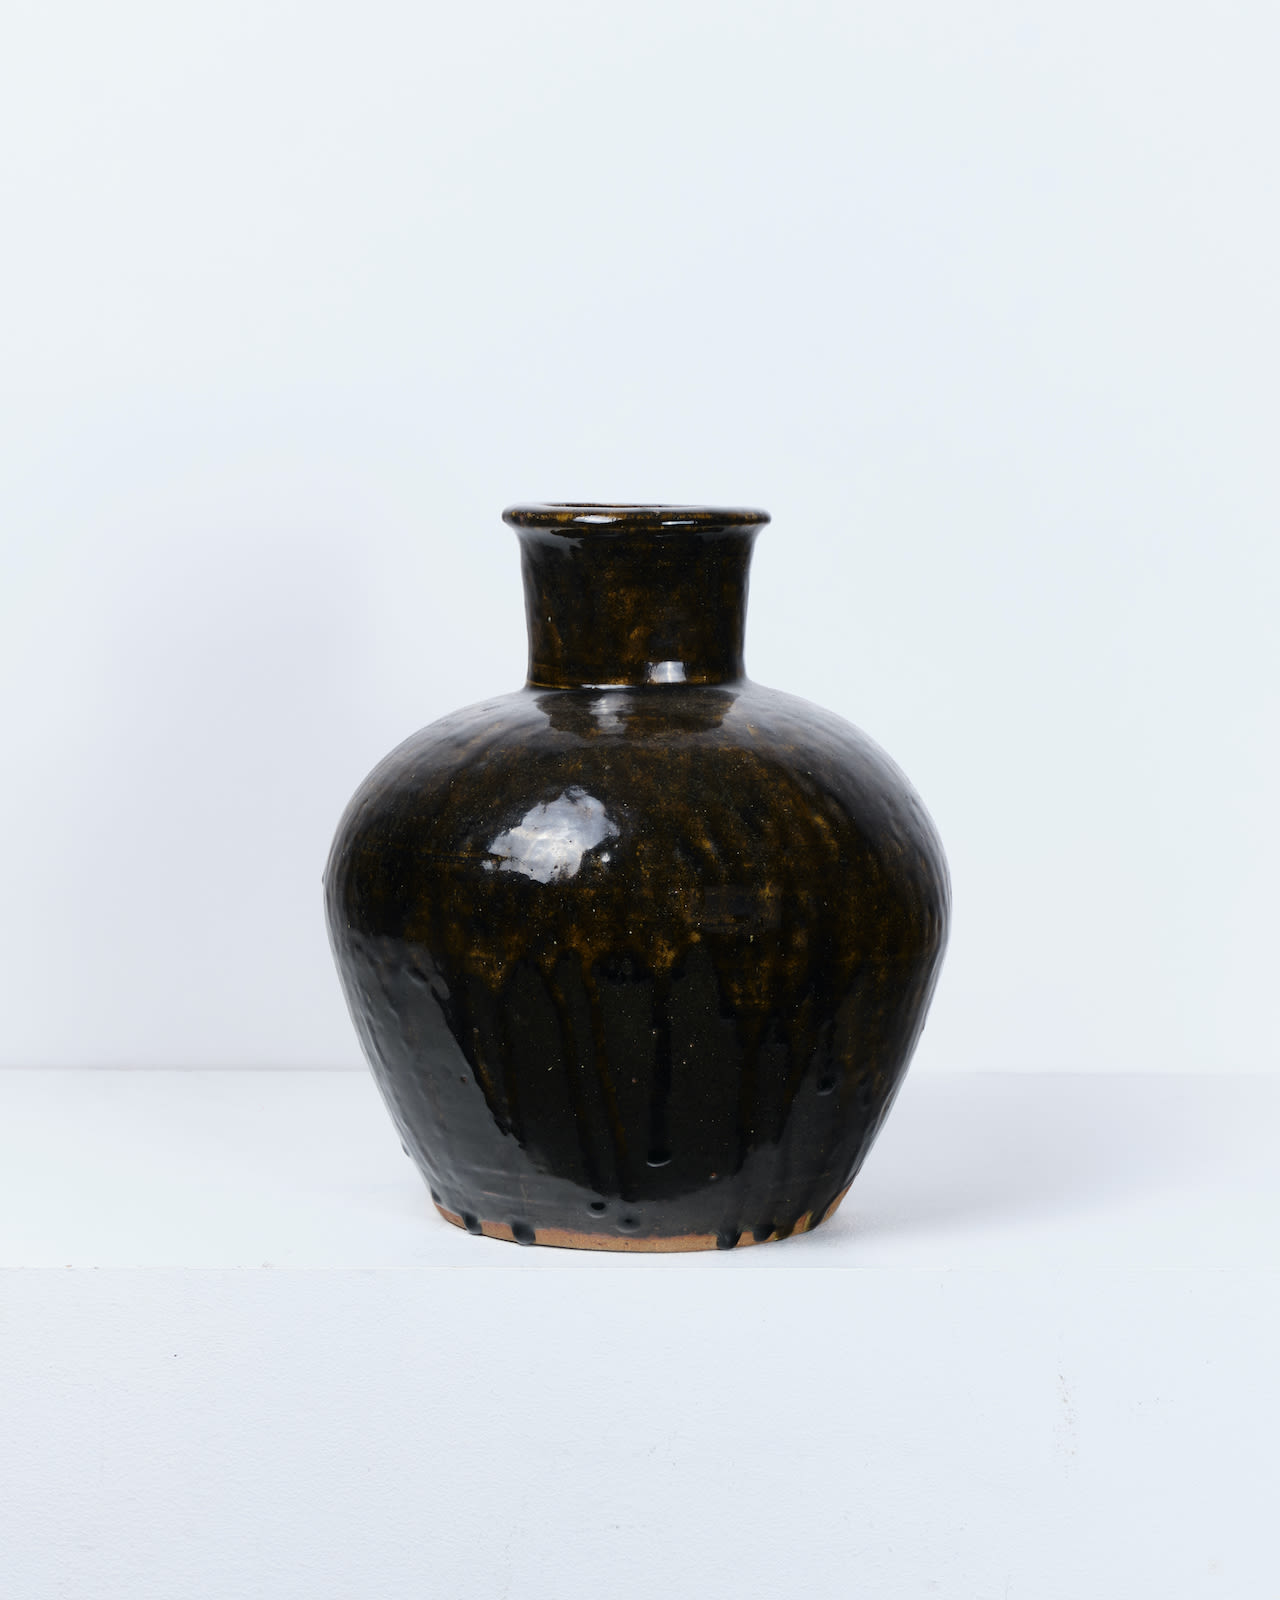 Trevor Corser, Globular vase